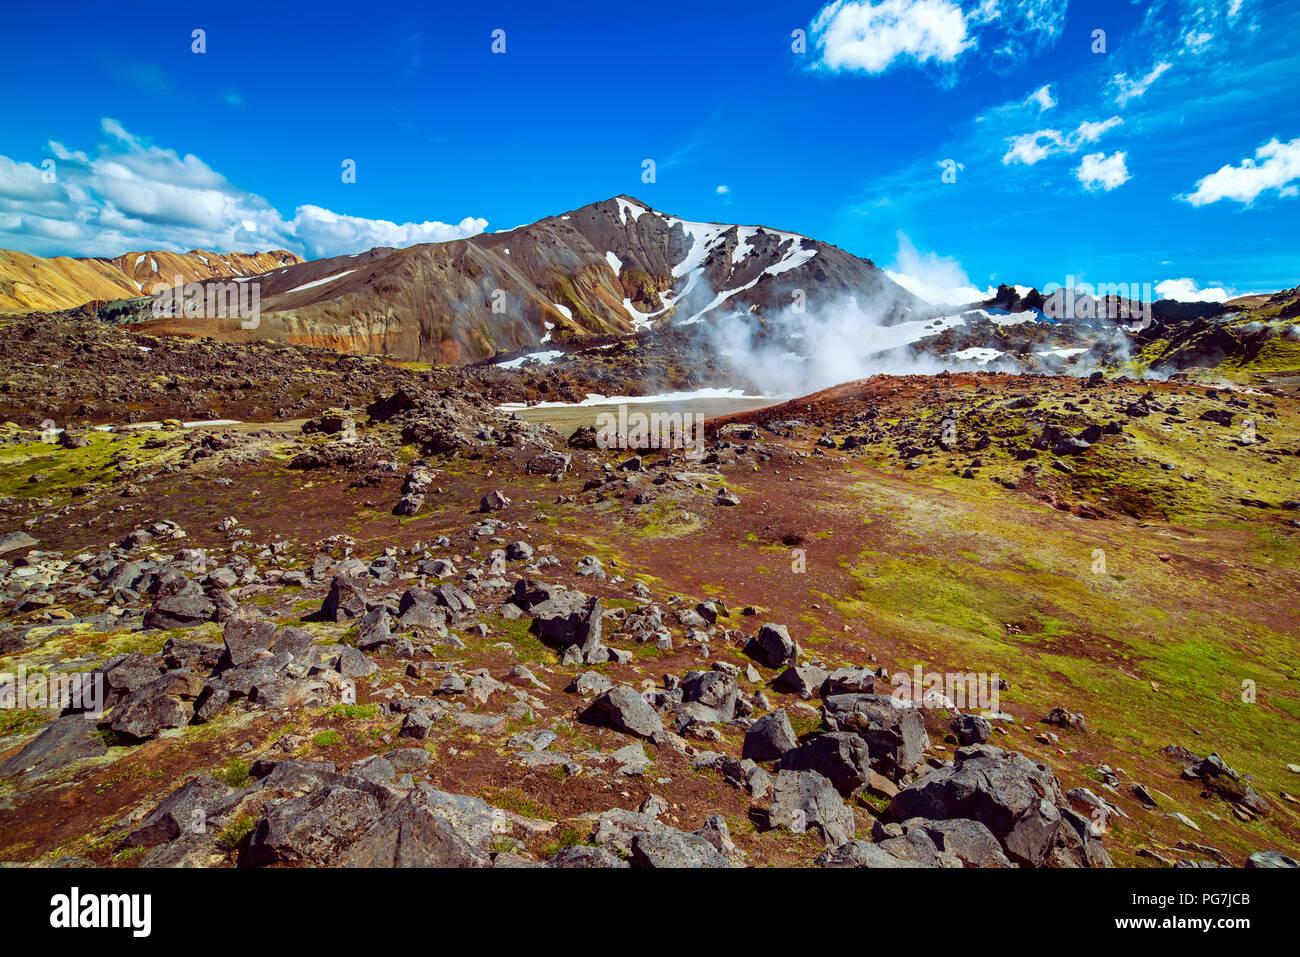 Landmannalaugar mountains, Iceland - Stock Image